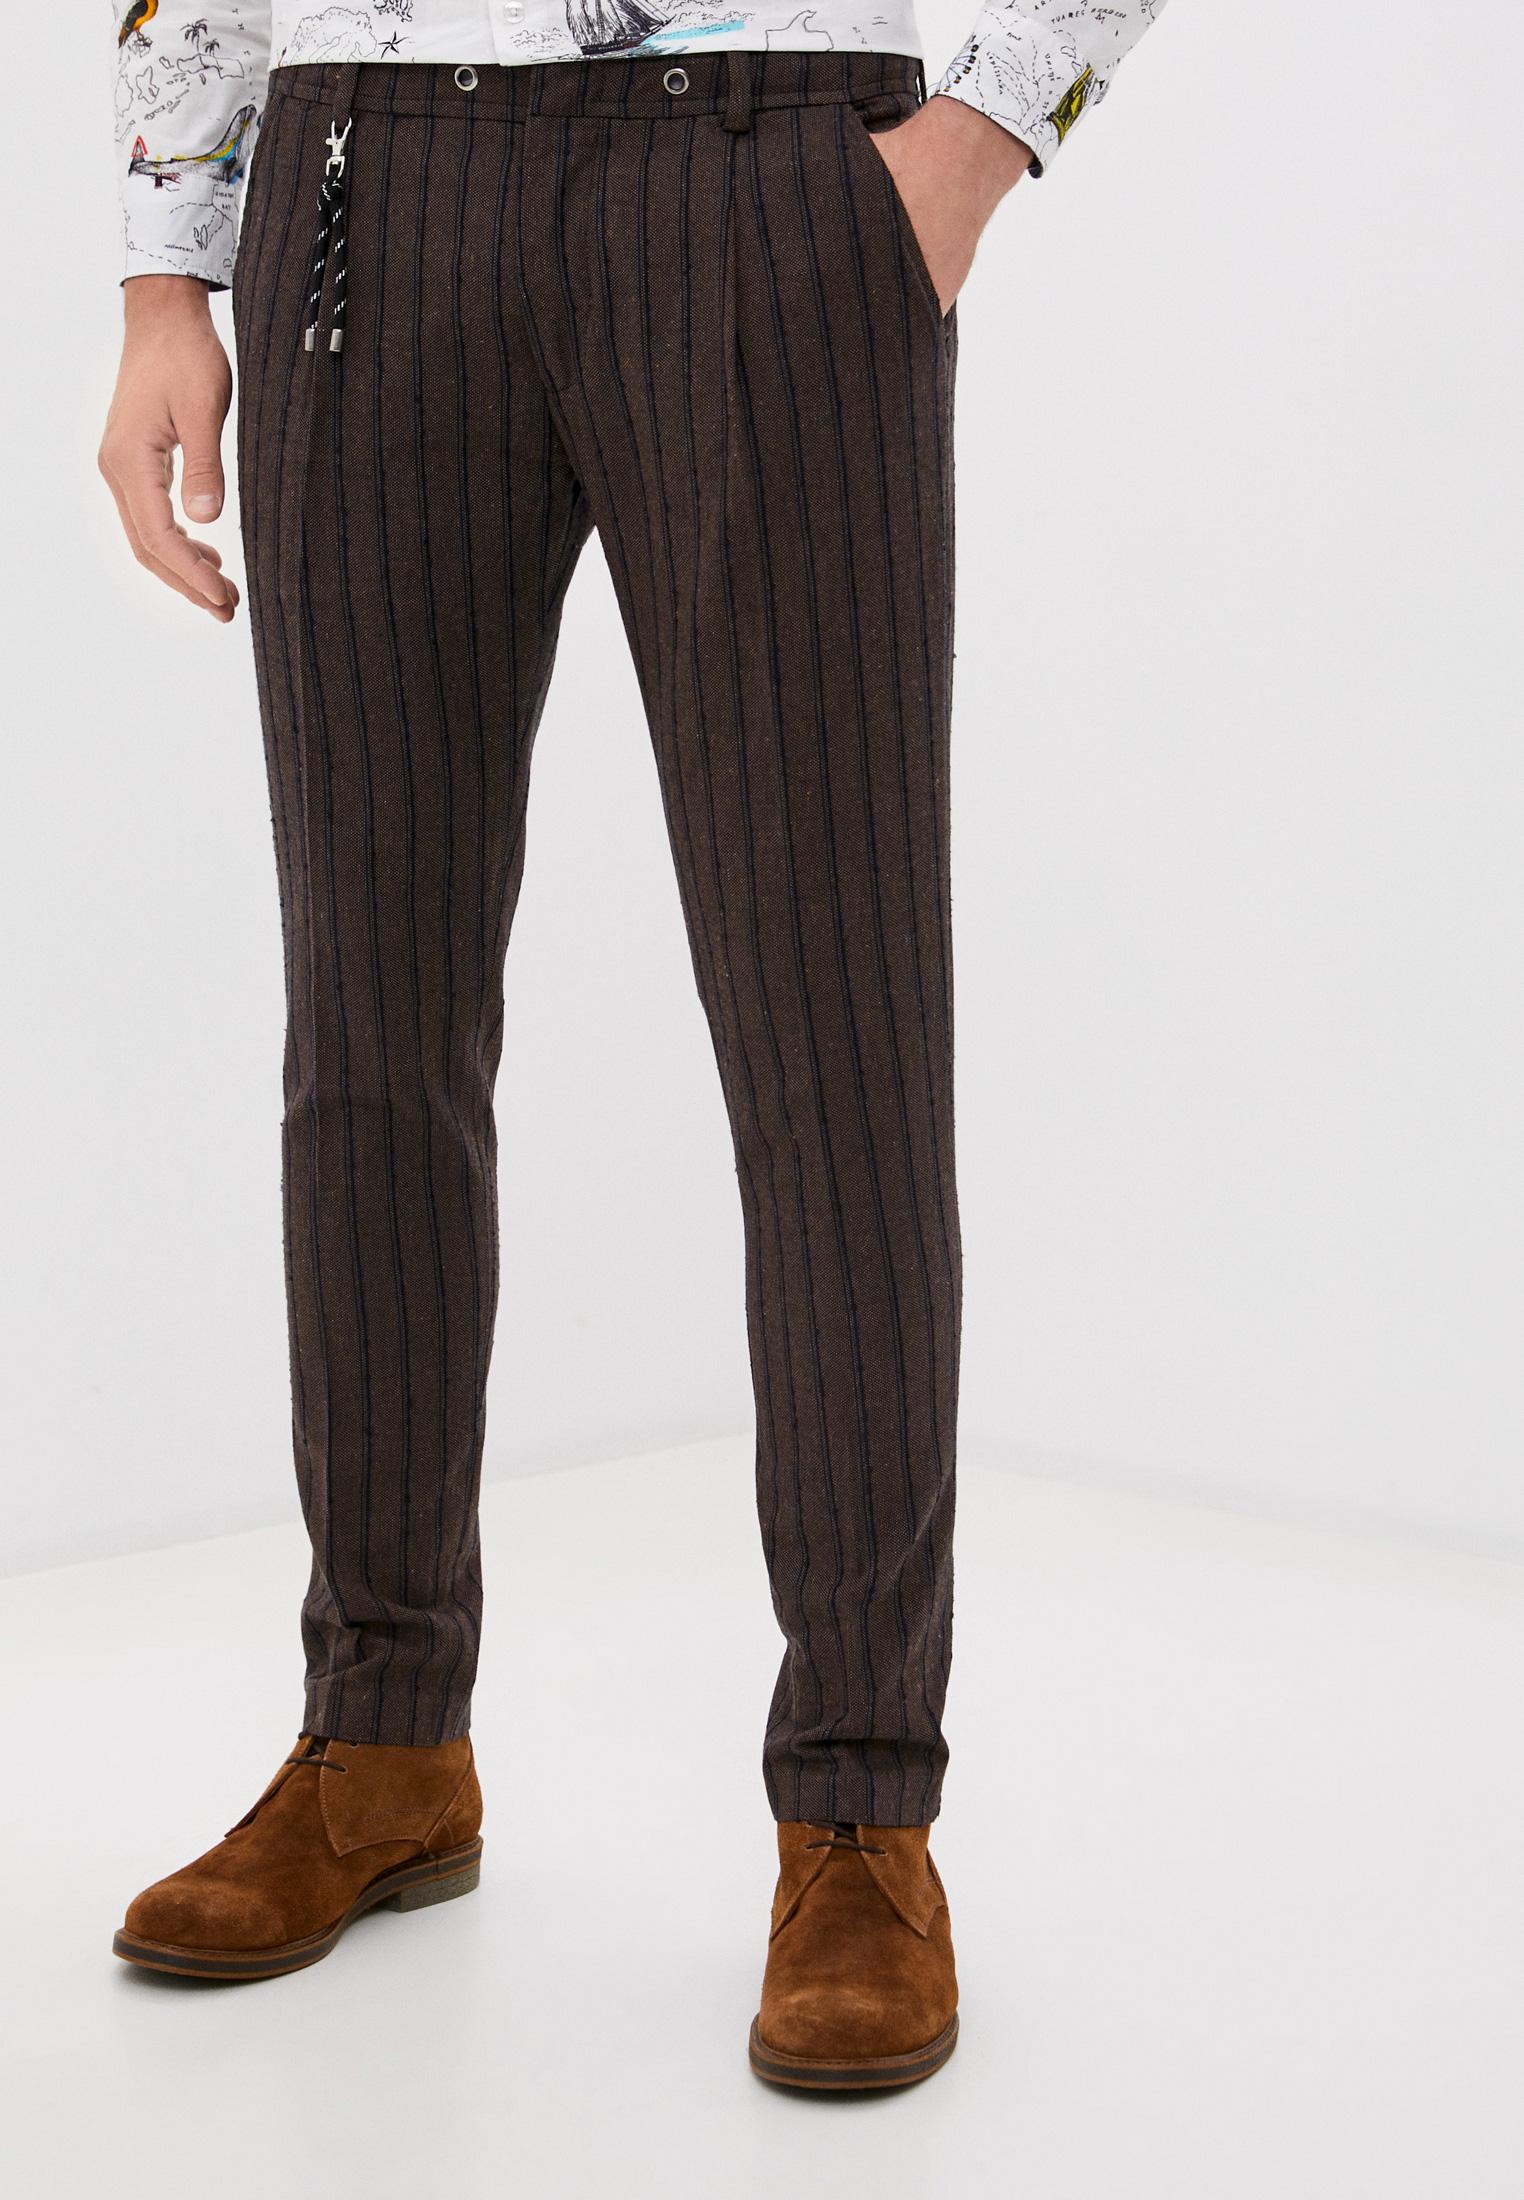 Мужские зауженные брюки Paul Martin's AI196315